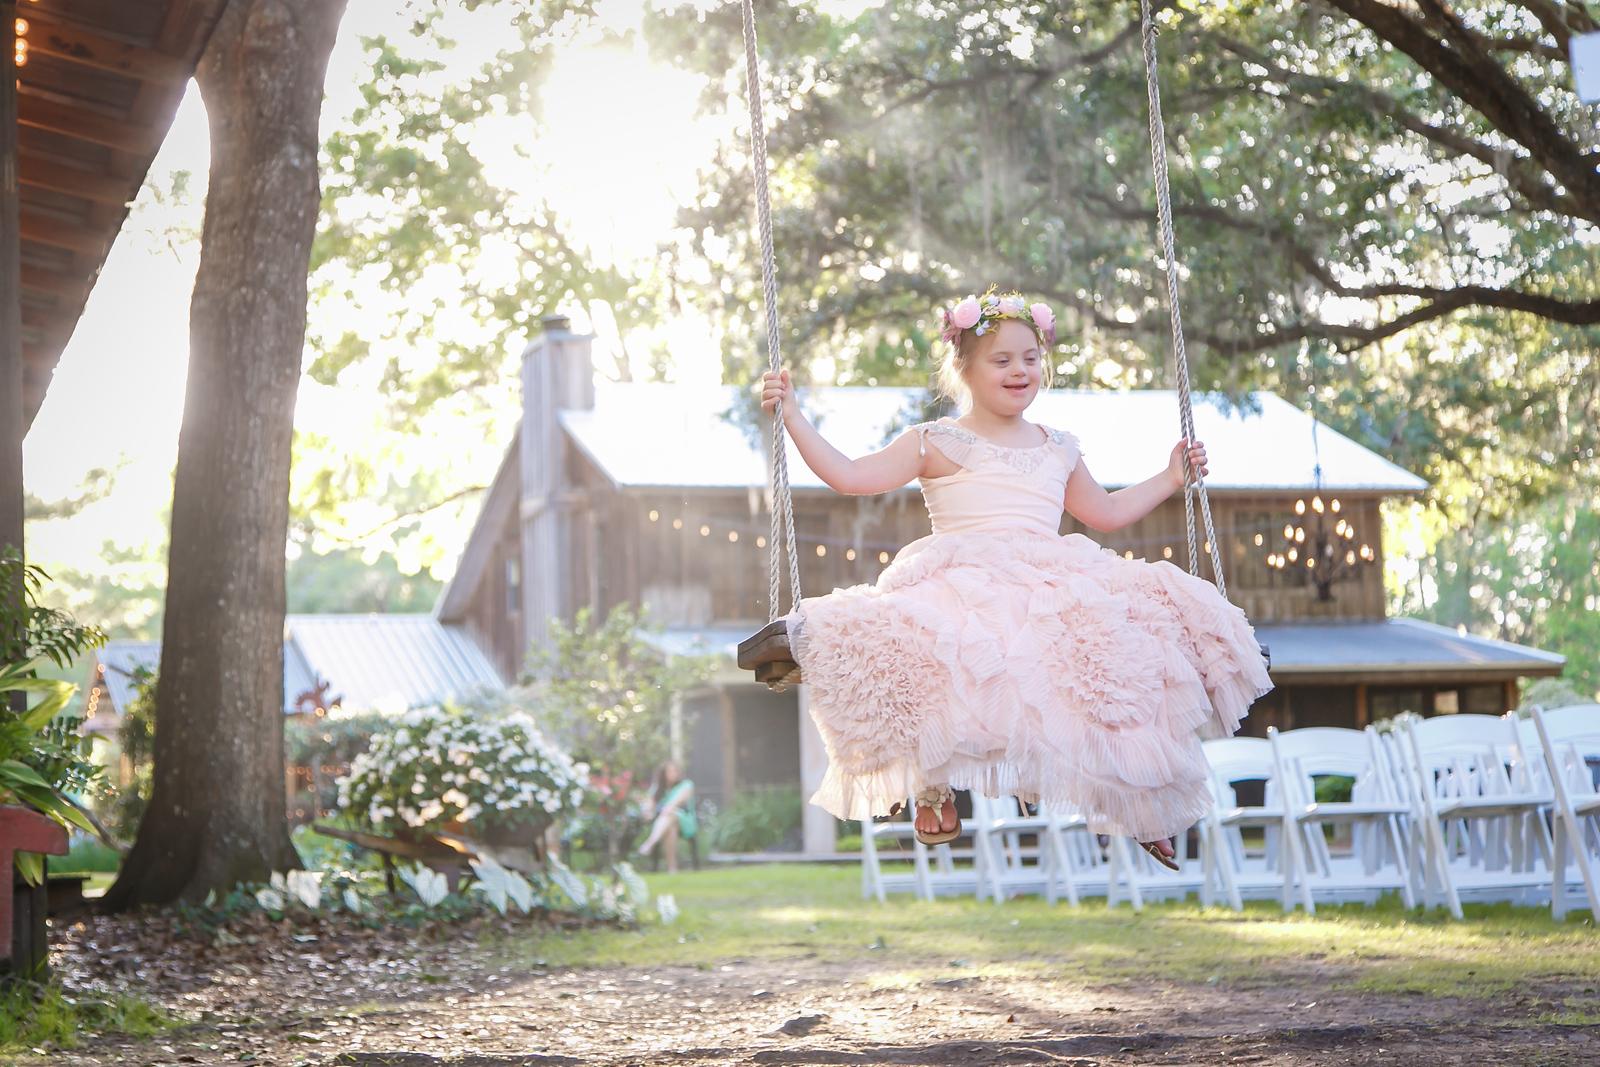 CAP2017-MadisonKyle-WEDDING-Giselle-TuckersFarmhouse-1016